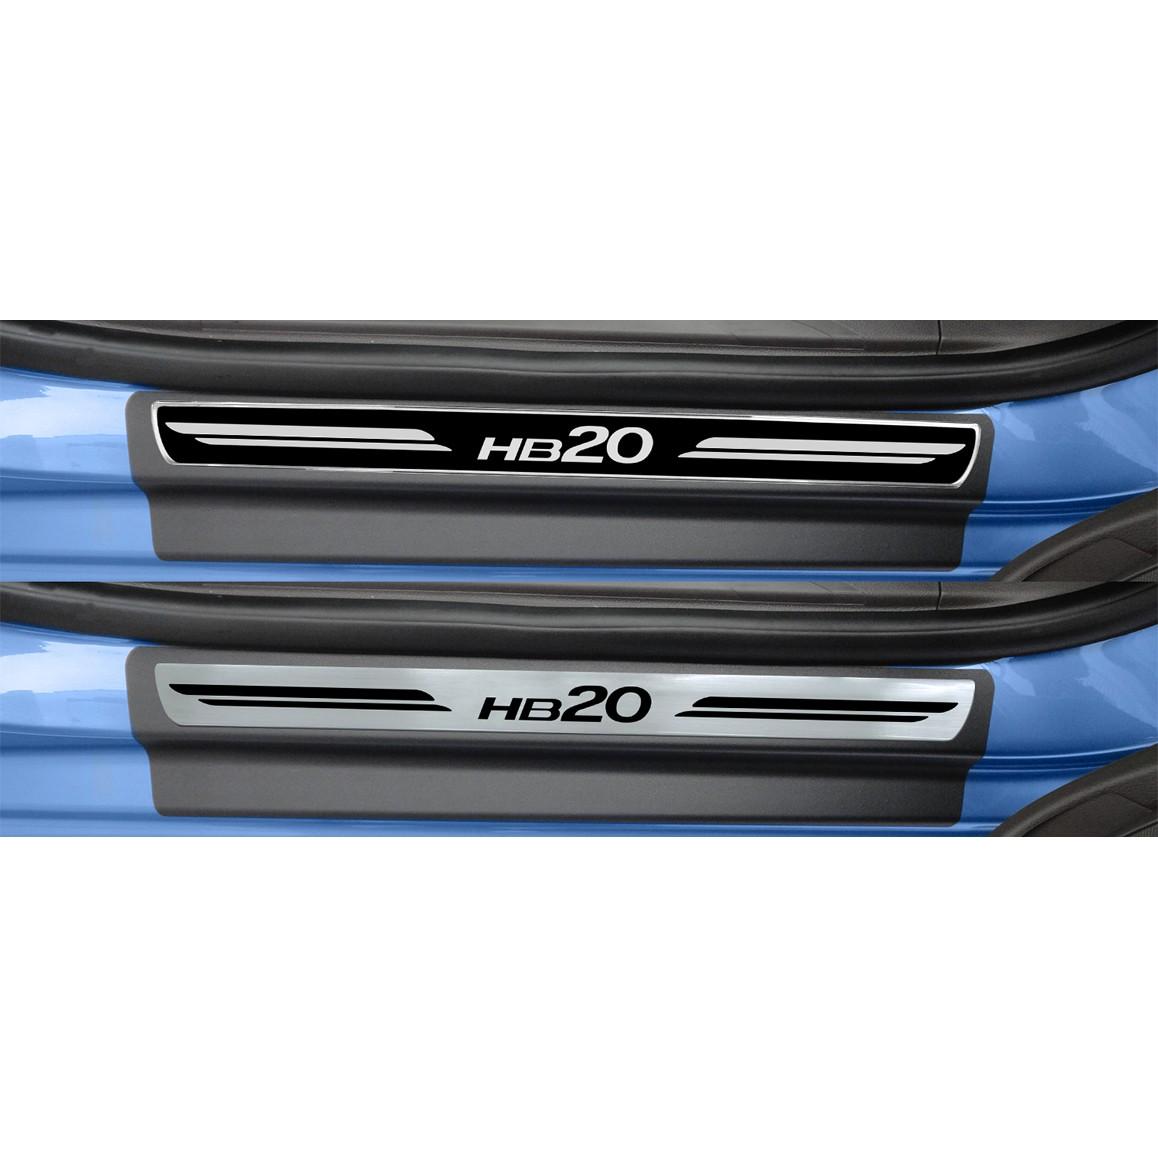 Jogo Soleira Premium Elegance Hyundai HB20 2012 2013 2014 2015 - ( Vinil + Resinada 4 Peças )